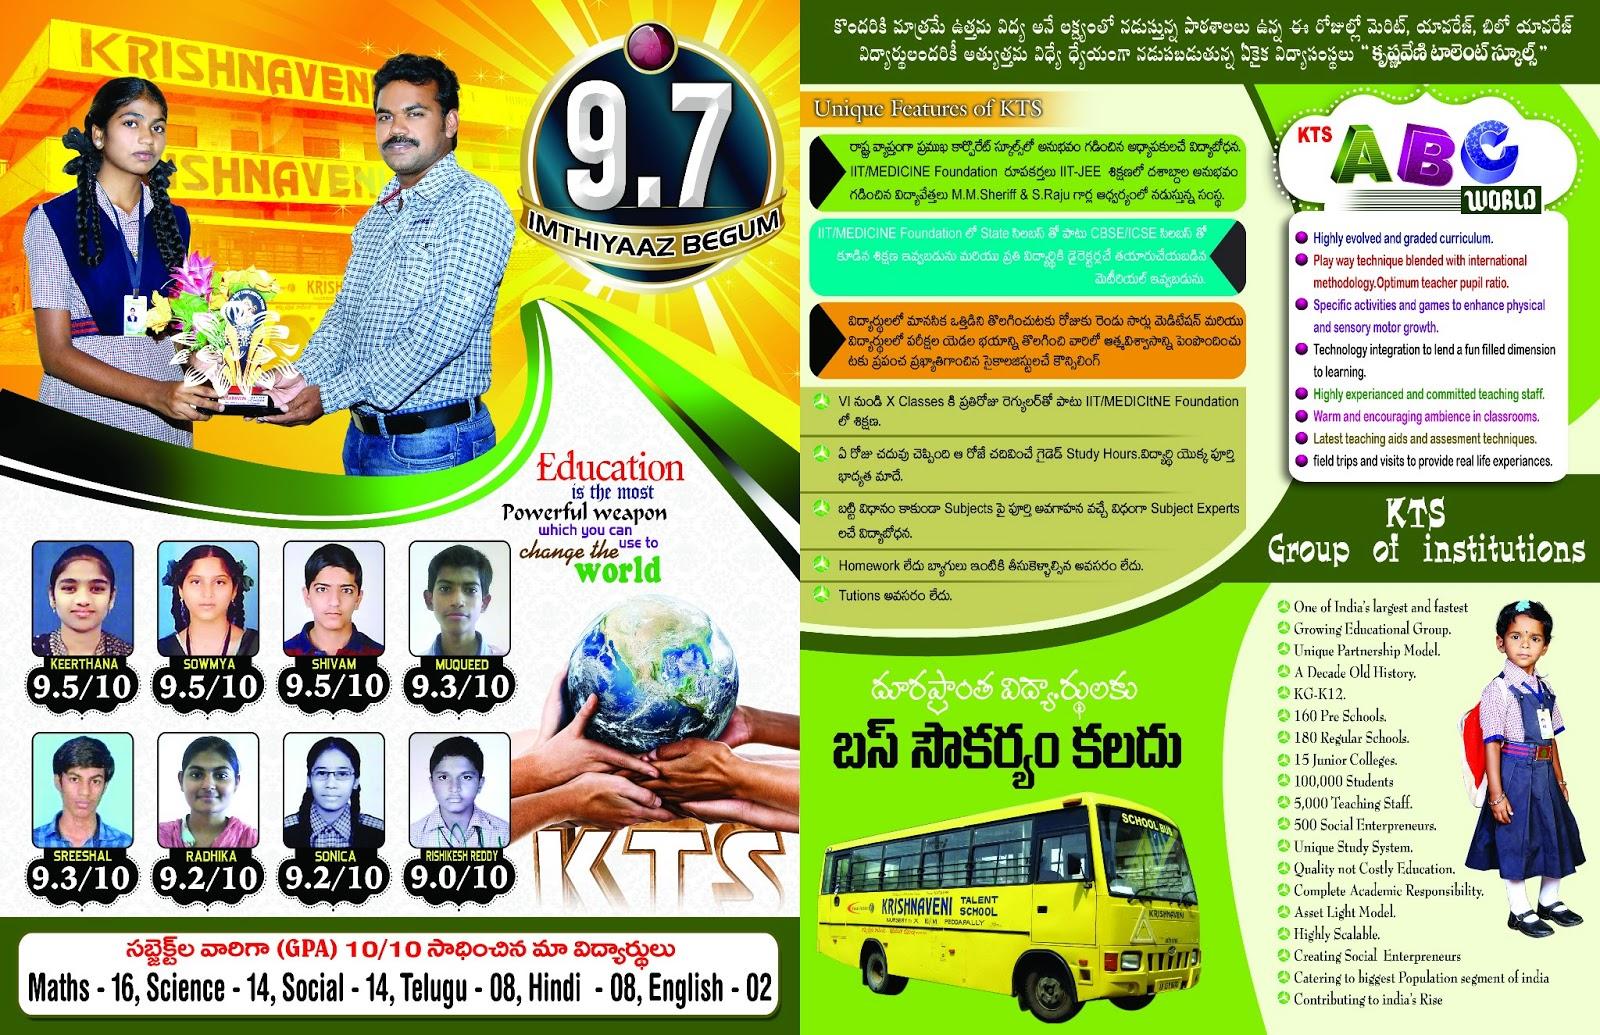 krishnaveni talent school custom brochure design template free download